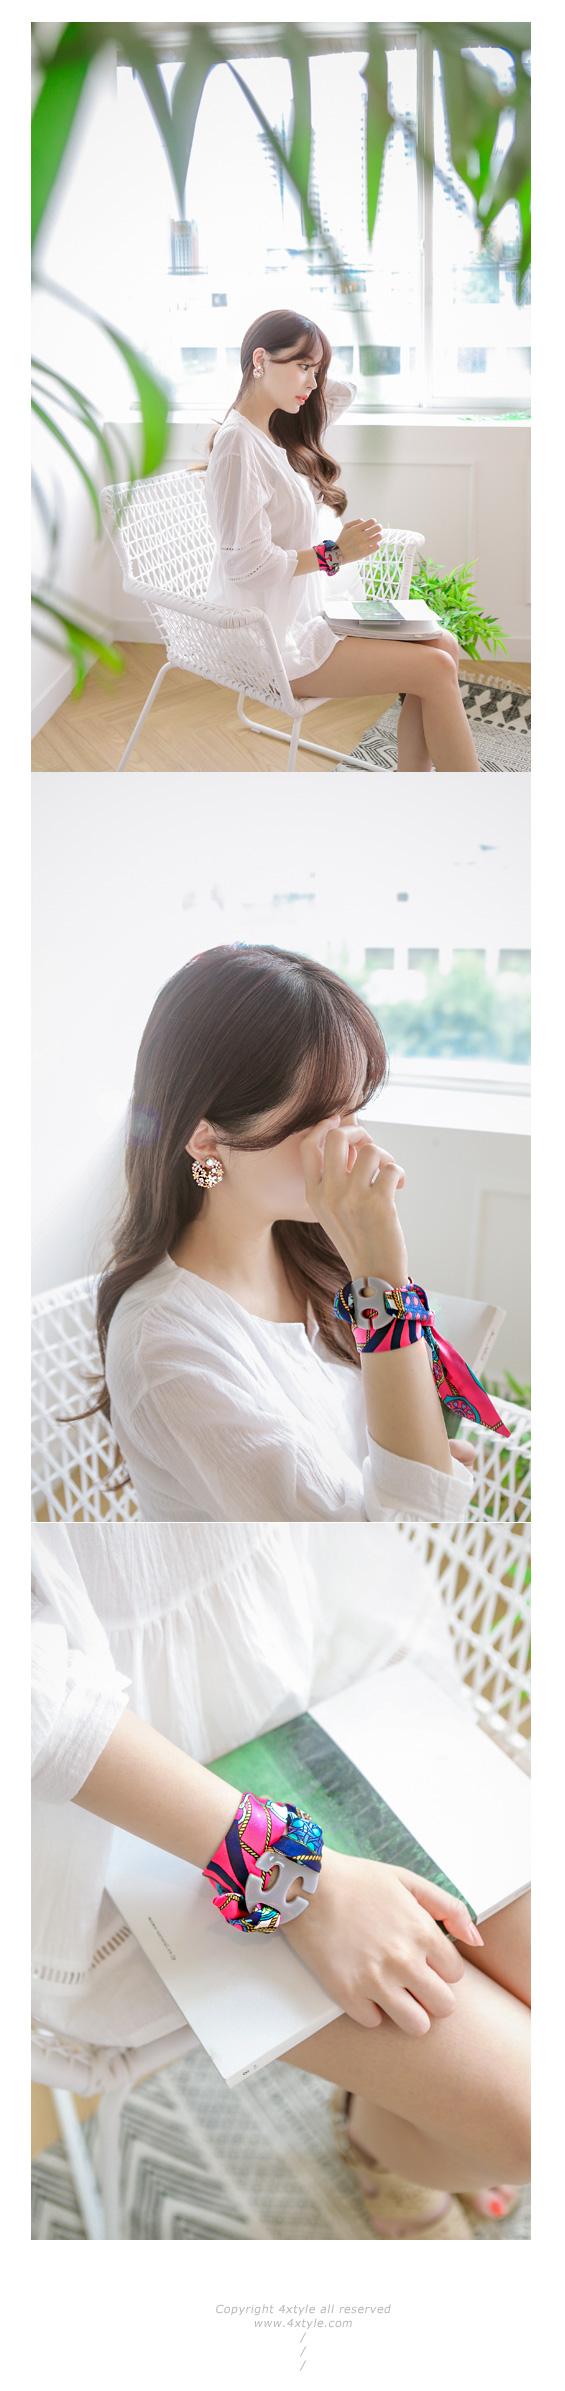 [ 4xtyle ] Babara花耳环、3种颜色